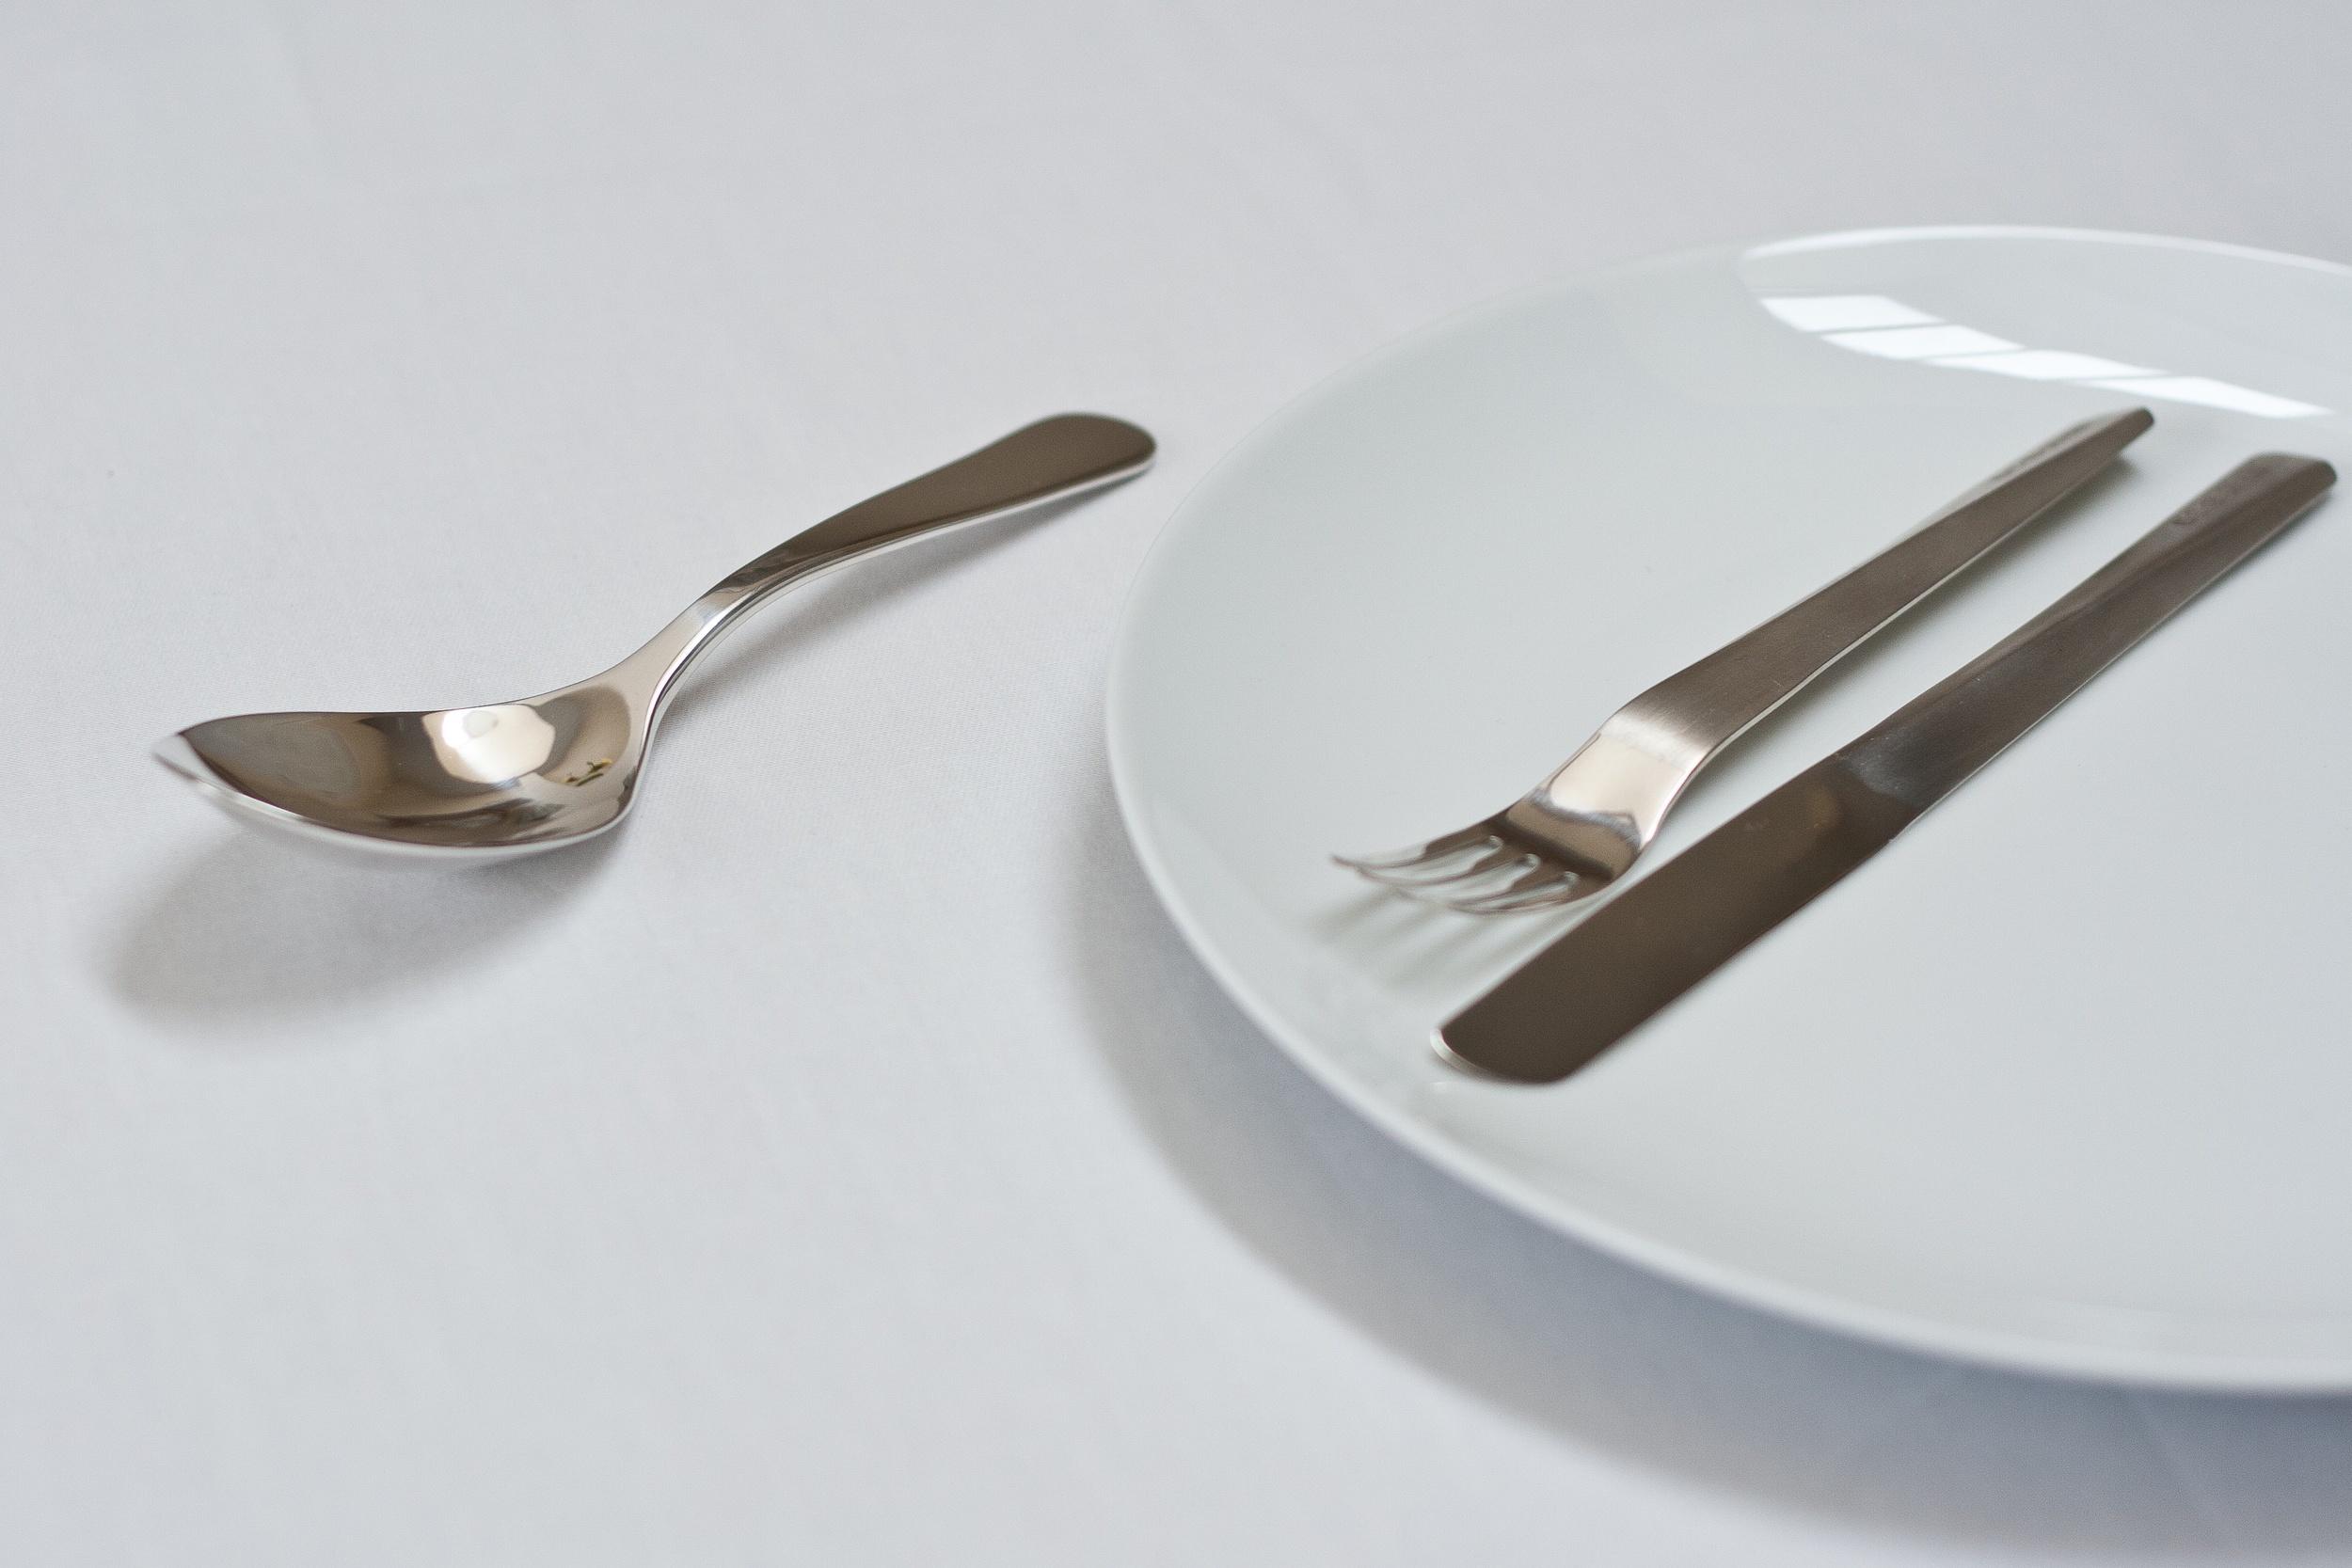 Cutlery set.jpg